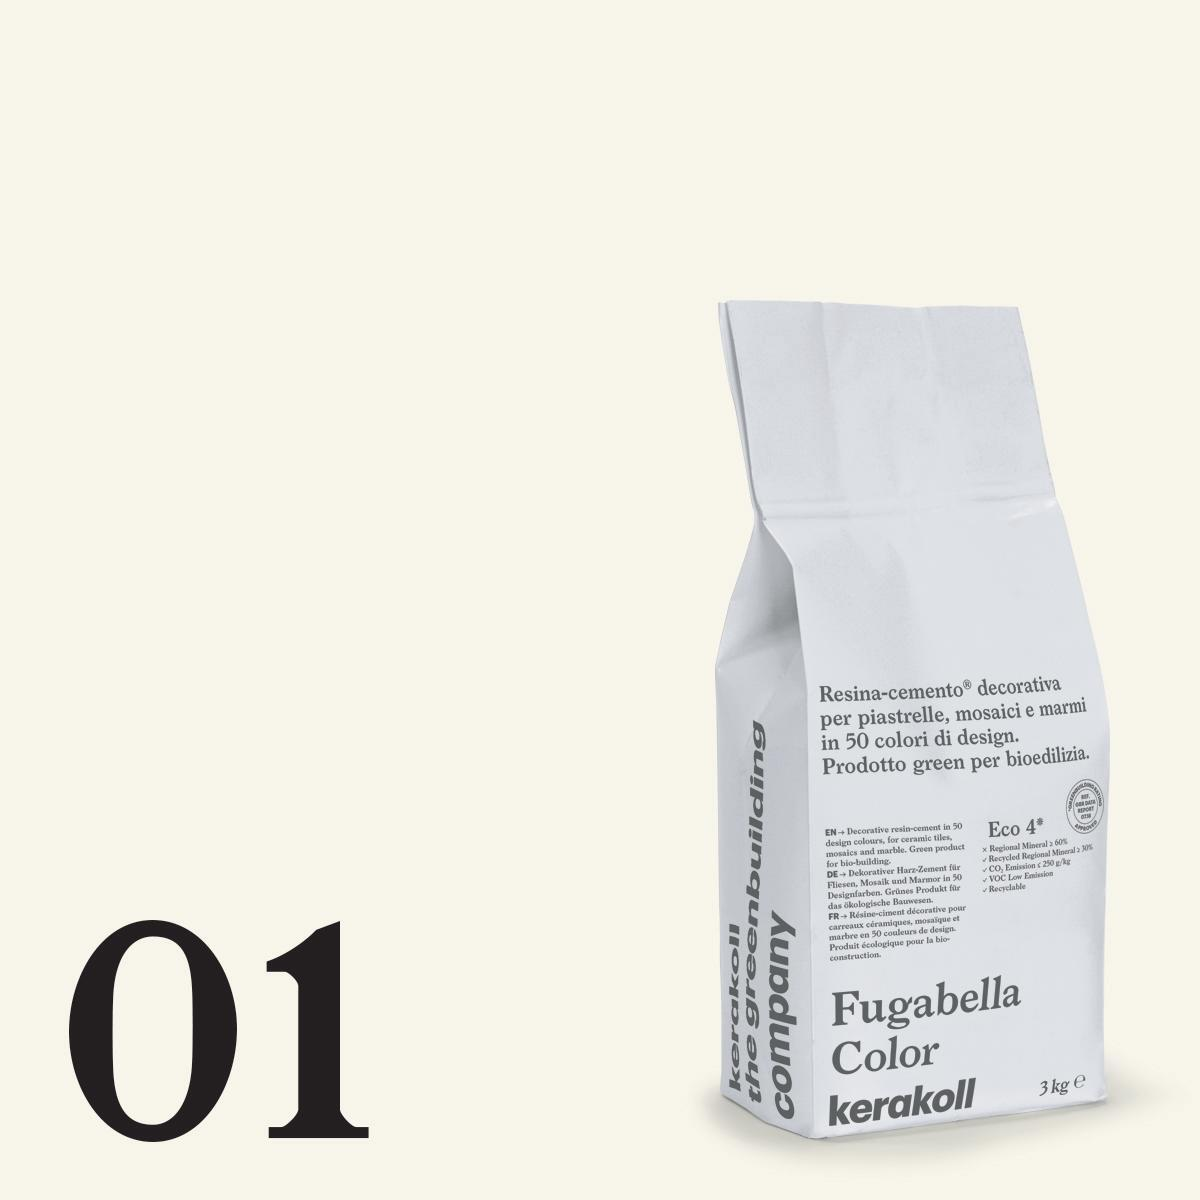 Stucco in polvere FUGABELLA COLOR KERAKOLL 3 kg bianco - 1